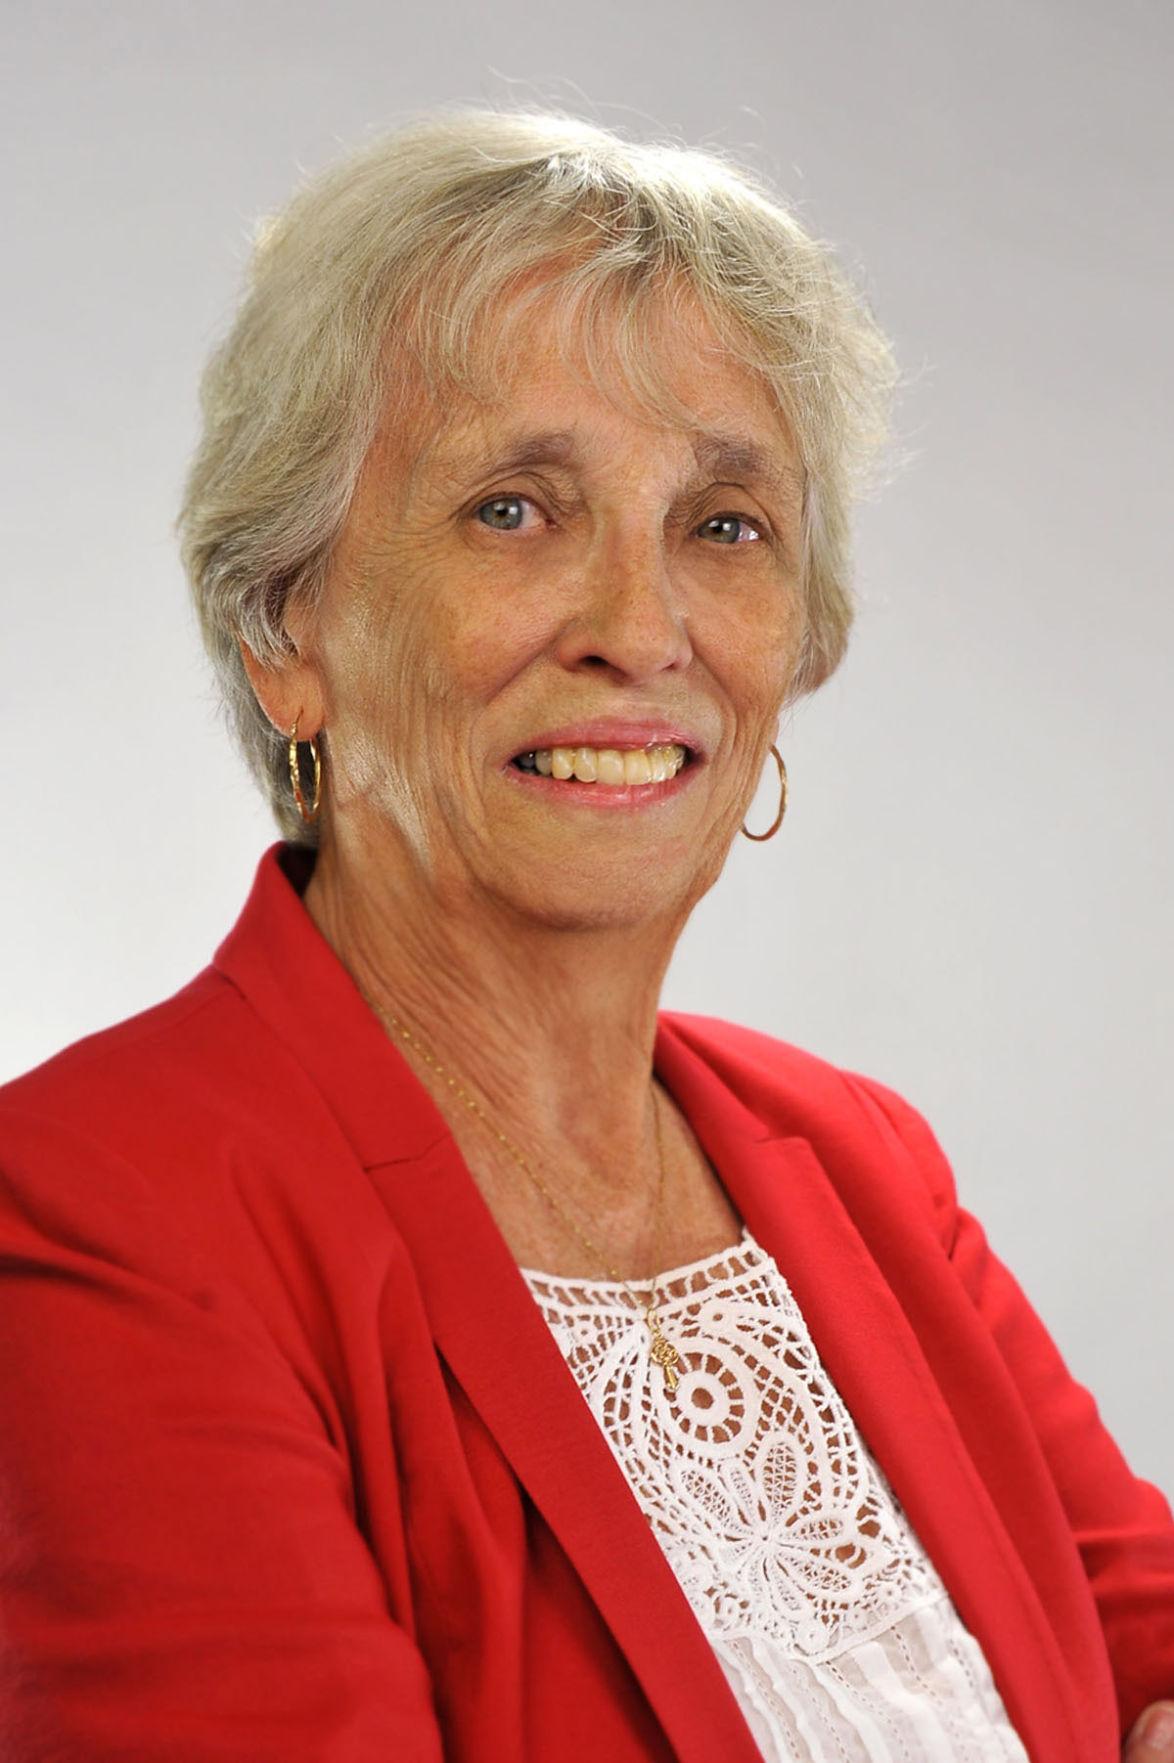 Elizabeth Glisky